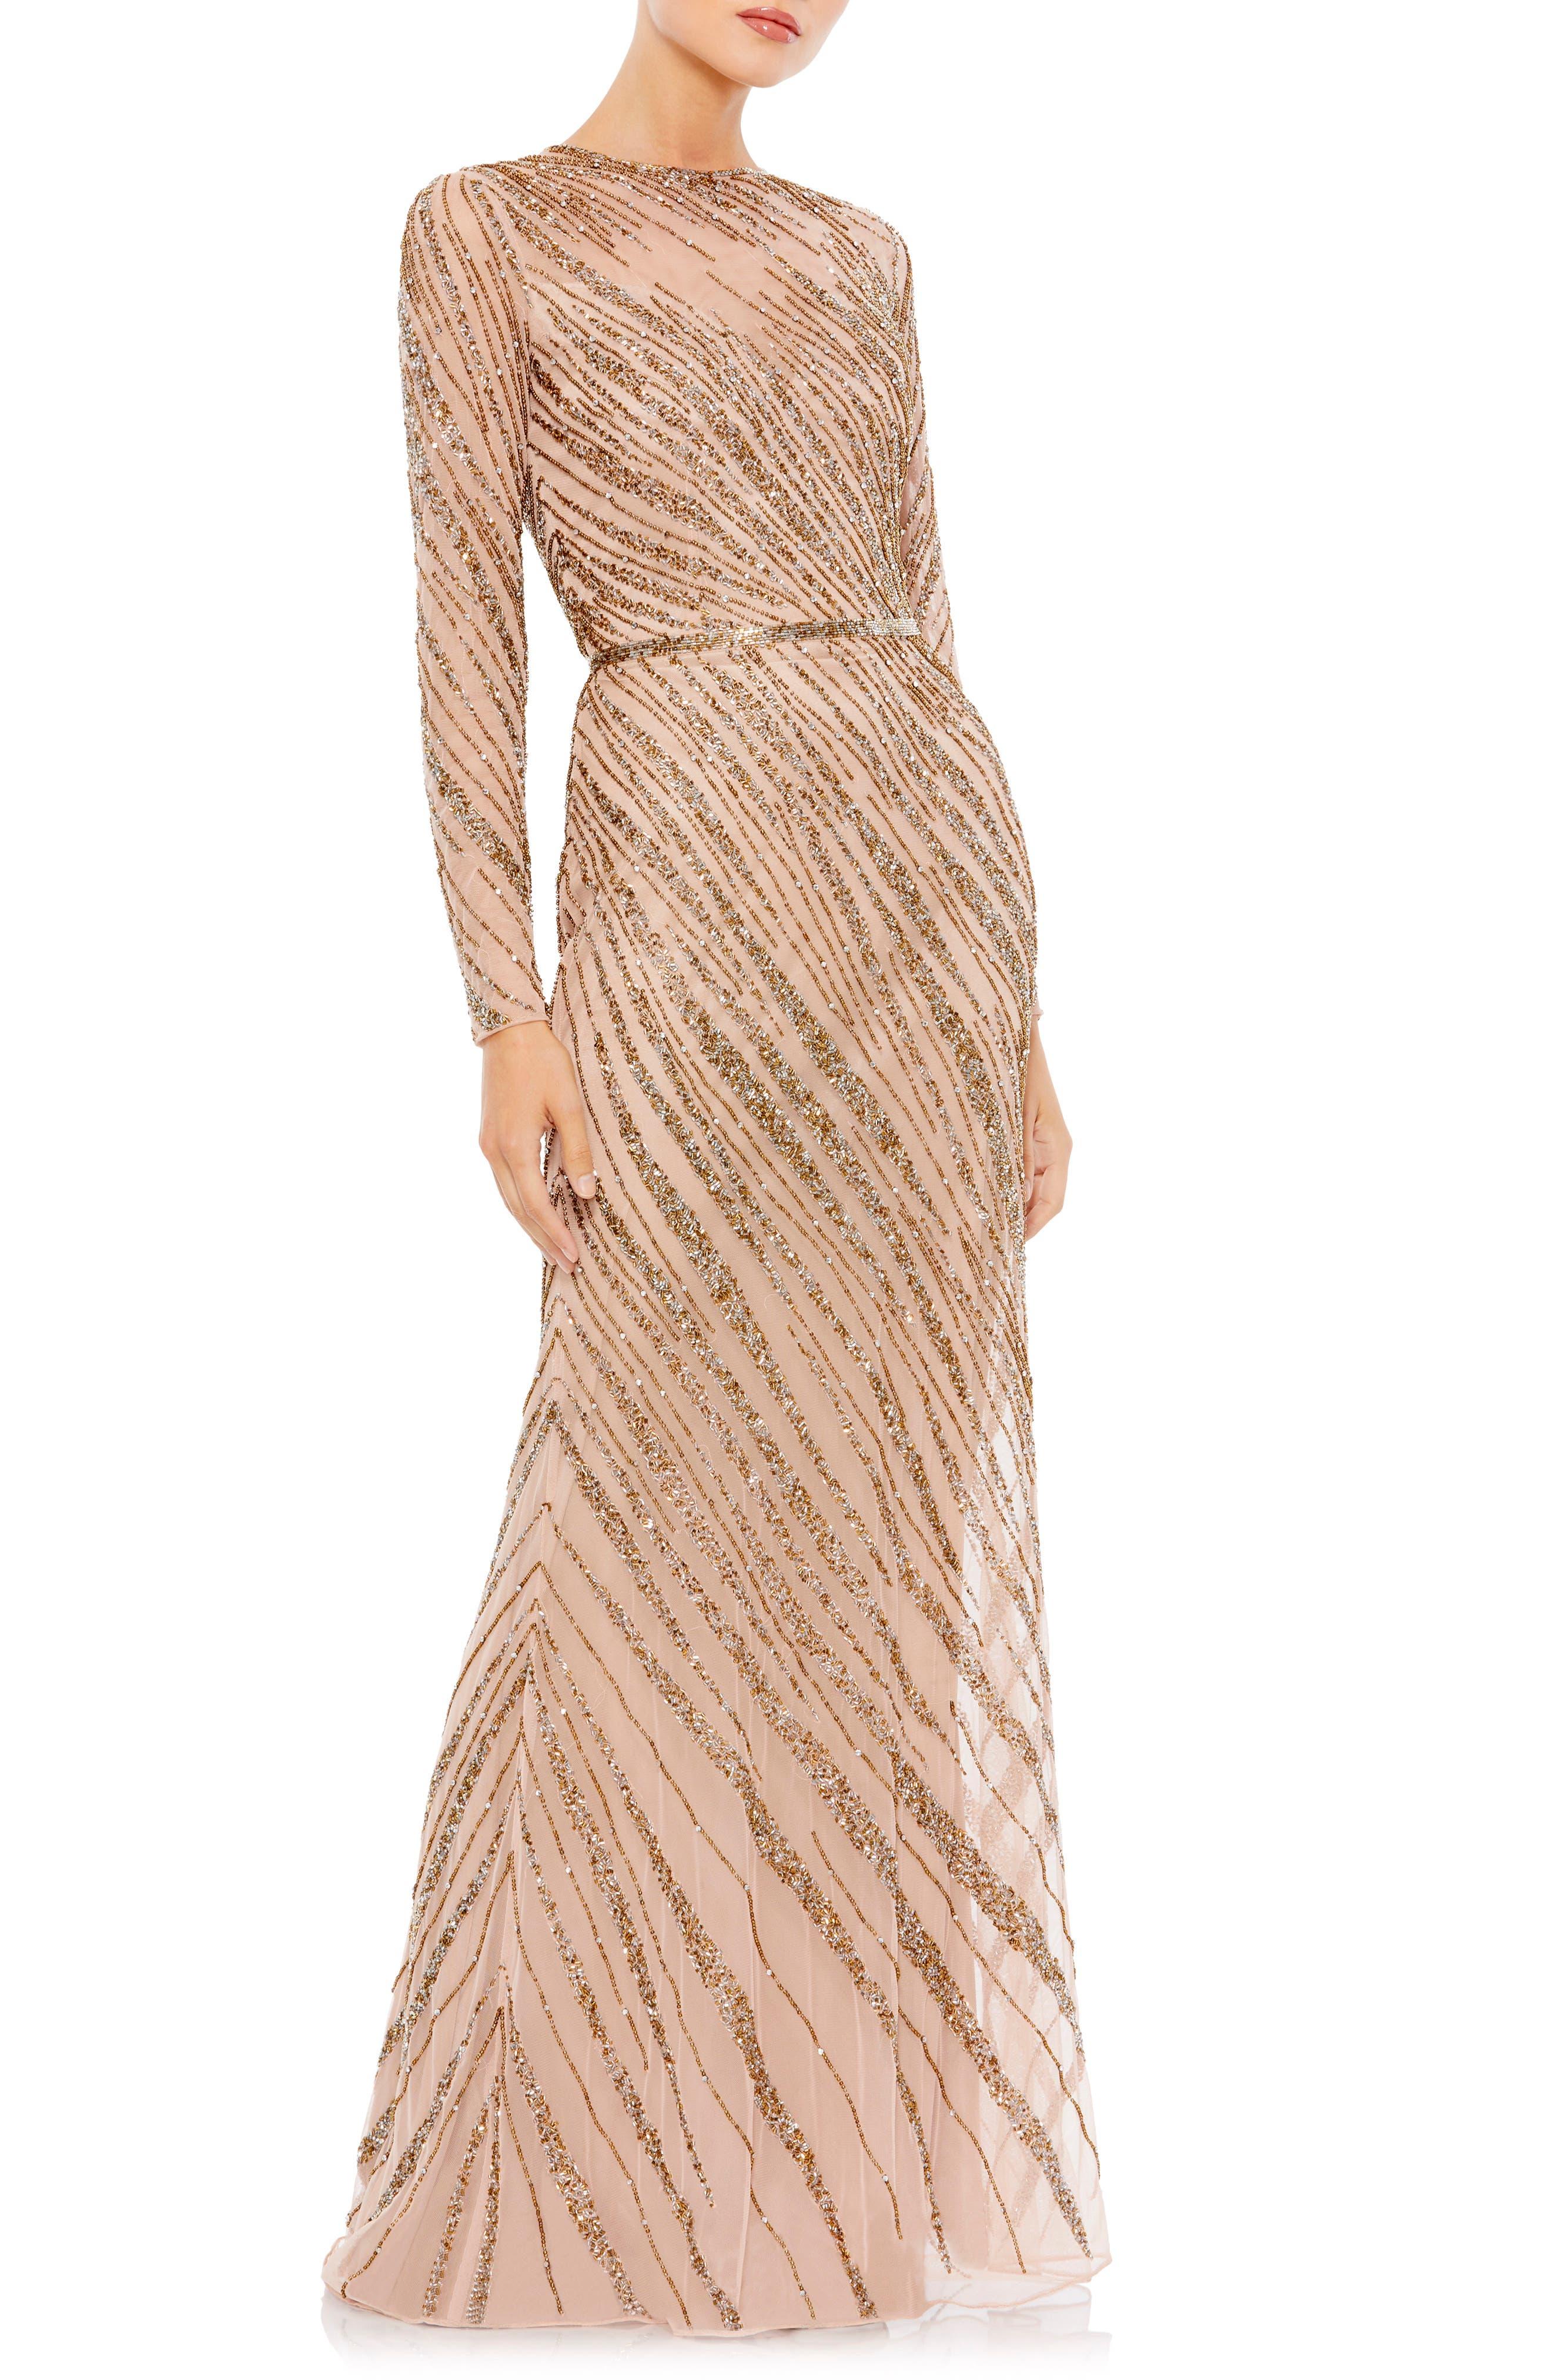 70s Sequin Dresses, Disco Dresses Womens MAC Duggal Beaded Long Sleeve Column Gown Size 18 - Brown $448.50 AT vintagedancer.com